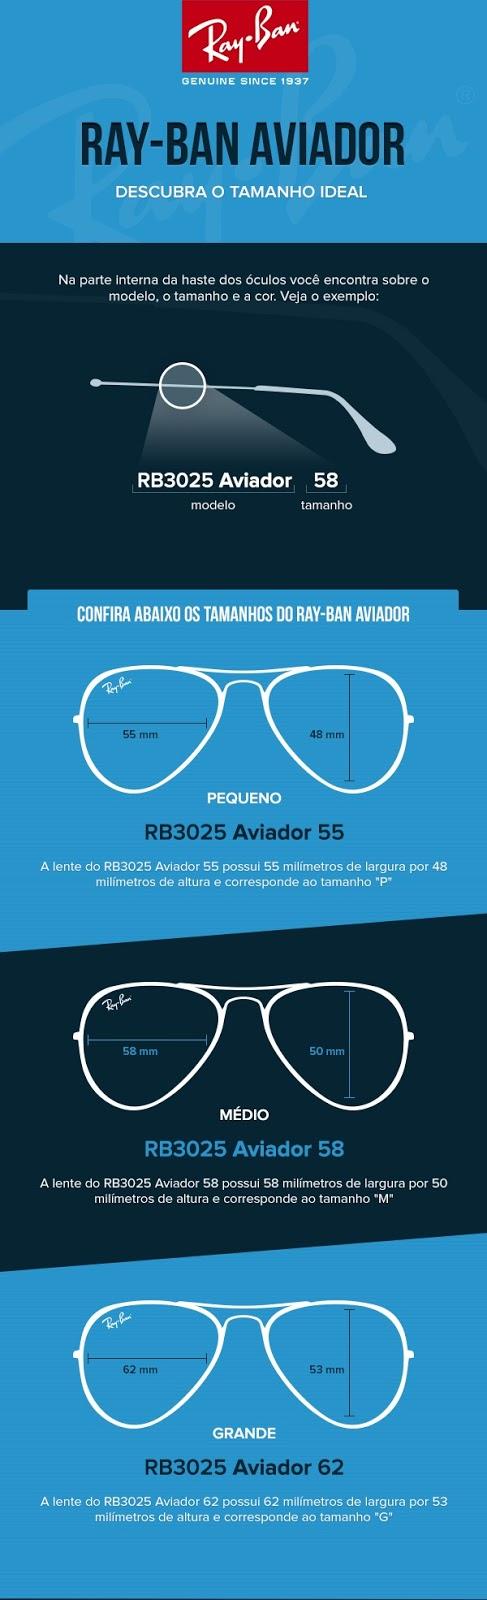 MODA PRAIA BLOG  óculos Ray-Ban RB3025 Aviador - COMO ESCOLHER b5580c6429